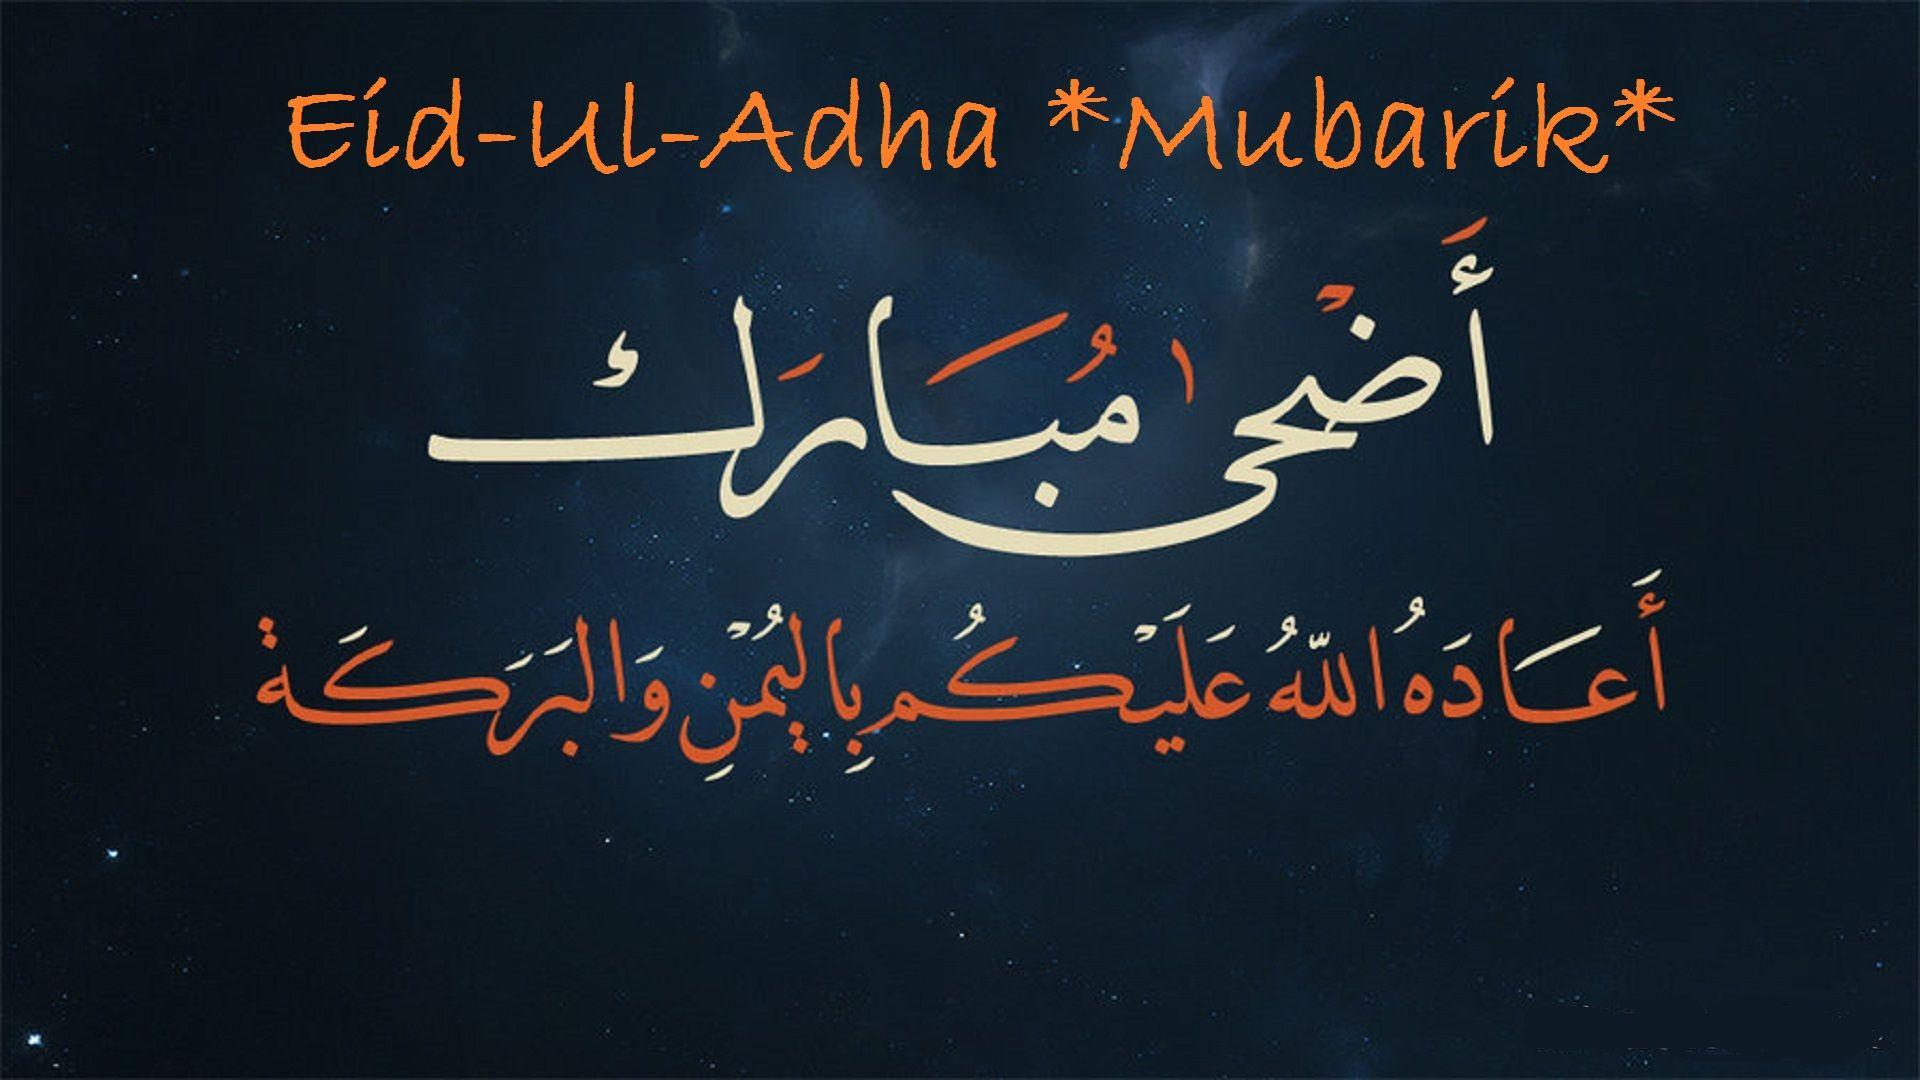 Eid Ul Adha Images Eid Ul Adha Images Eid Ul Adha Eid Mubarak